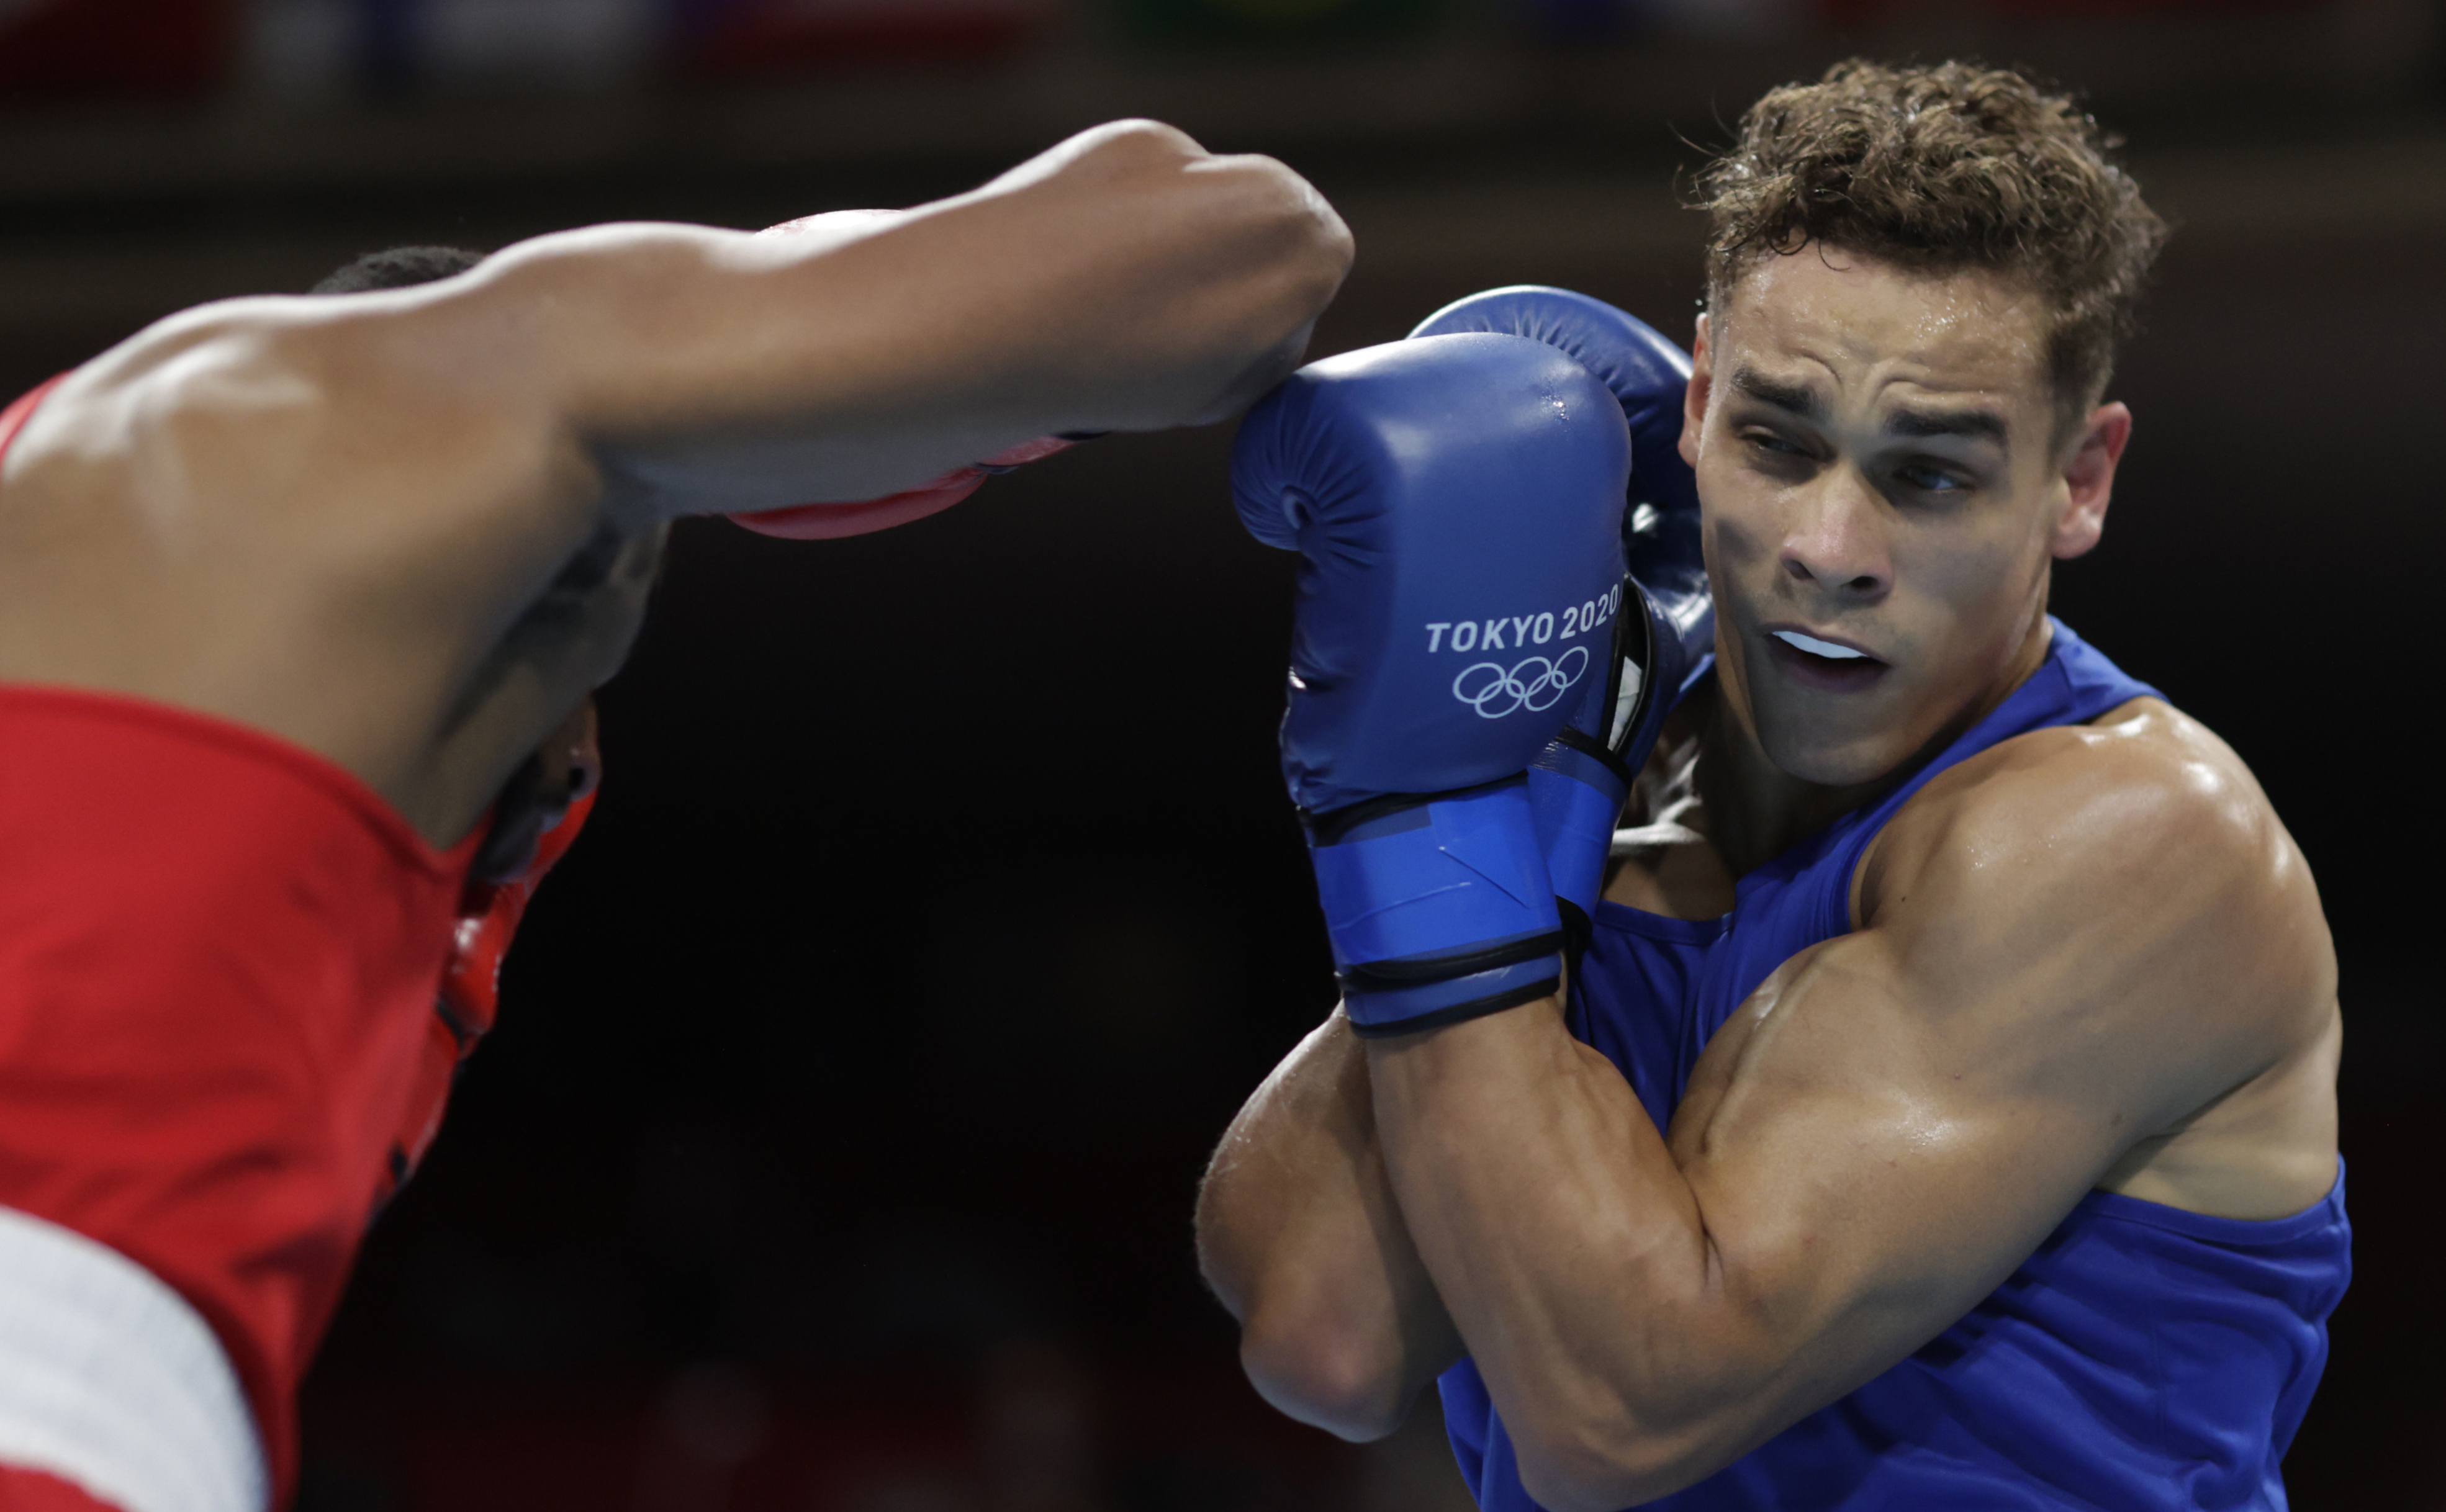 Tokyo 2020 Olympics - Boxing - Men's Heavyweight - Last 16 - Kokugikan Arena - Tokyo, Japan - July 27, 2021. Youness Baalla of Morocco in action against David Nyika of New Zealand REUTERS/Ueslei Marcelino